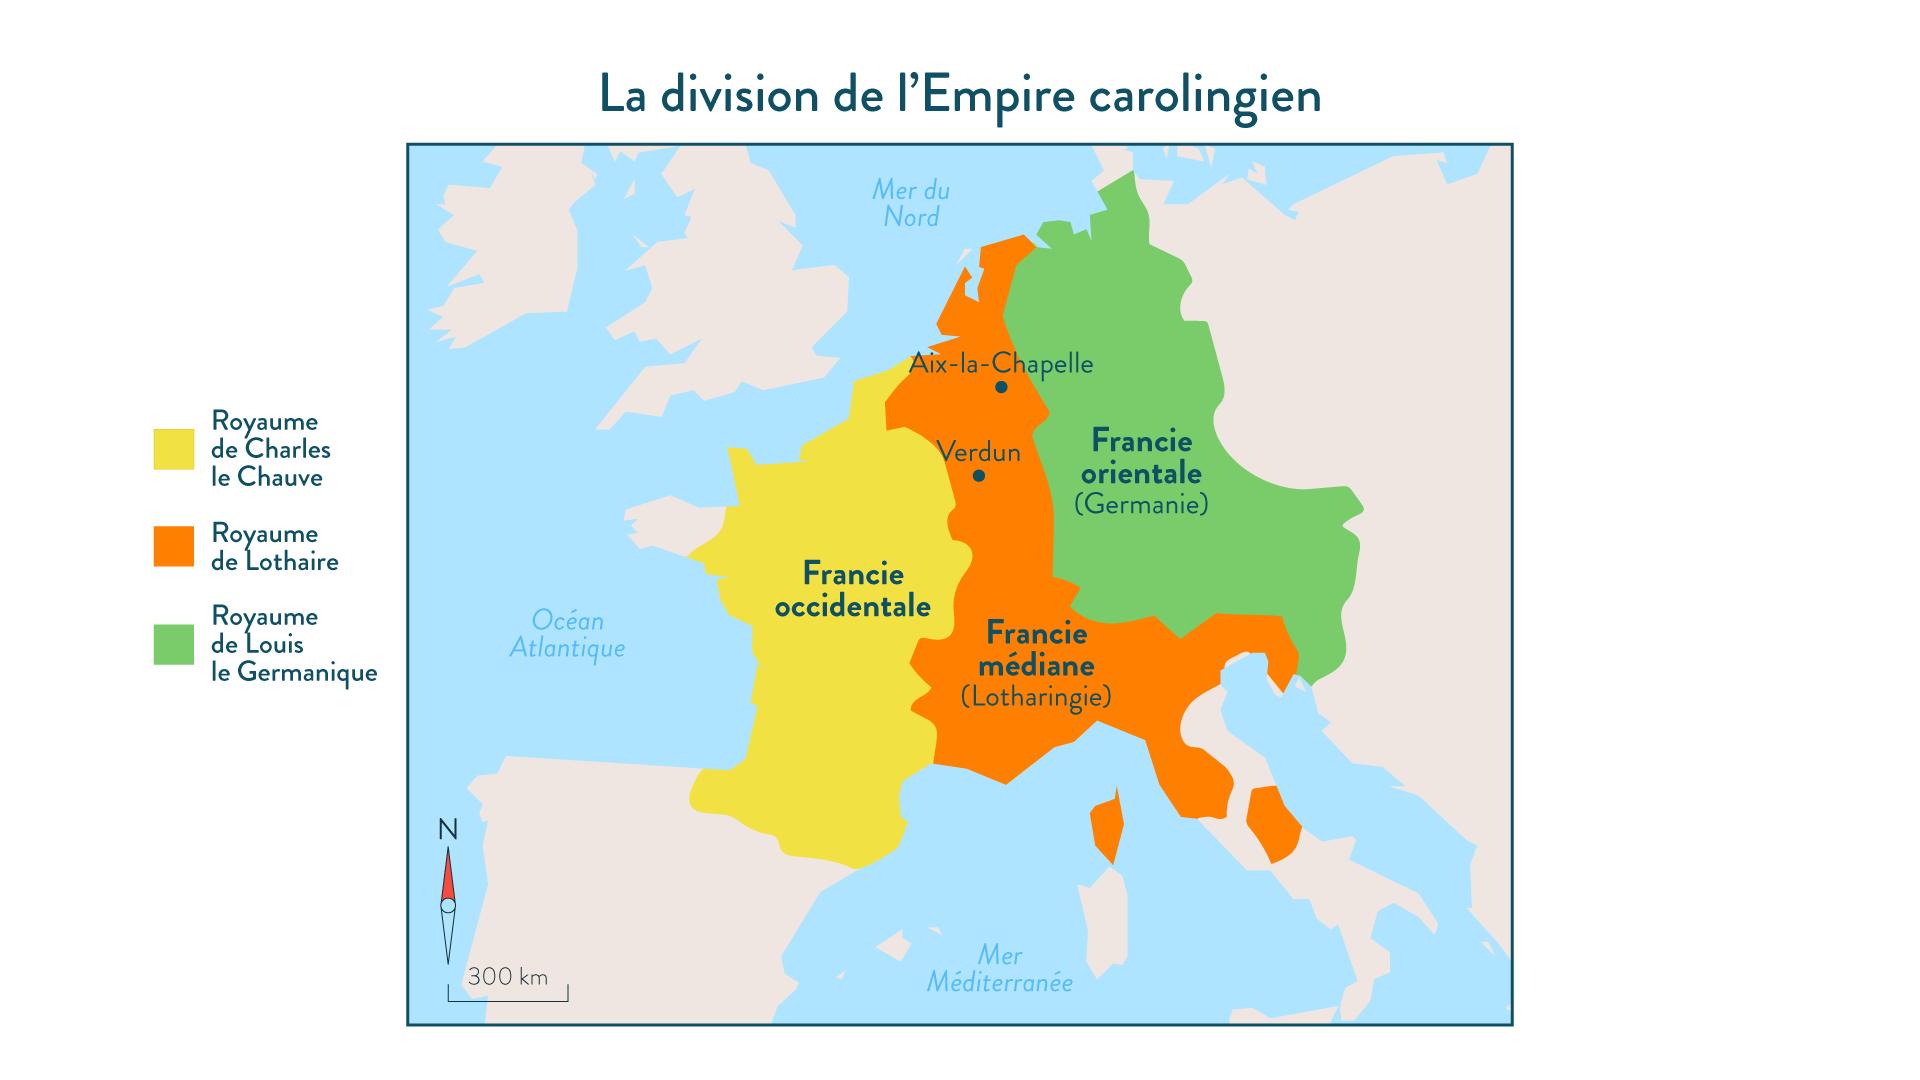 La division de lEmpire carolingien - 5e - histoire